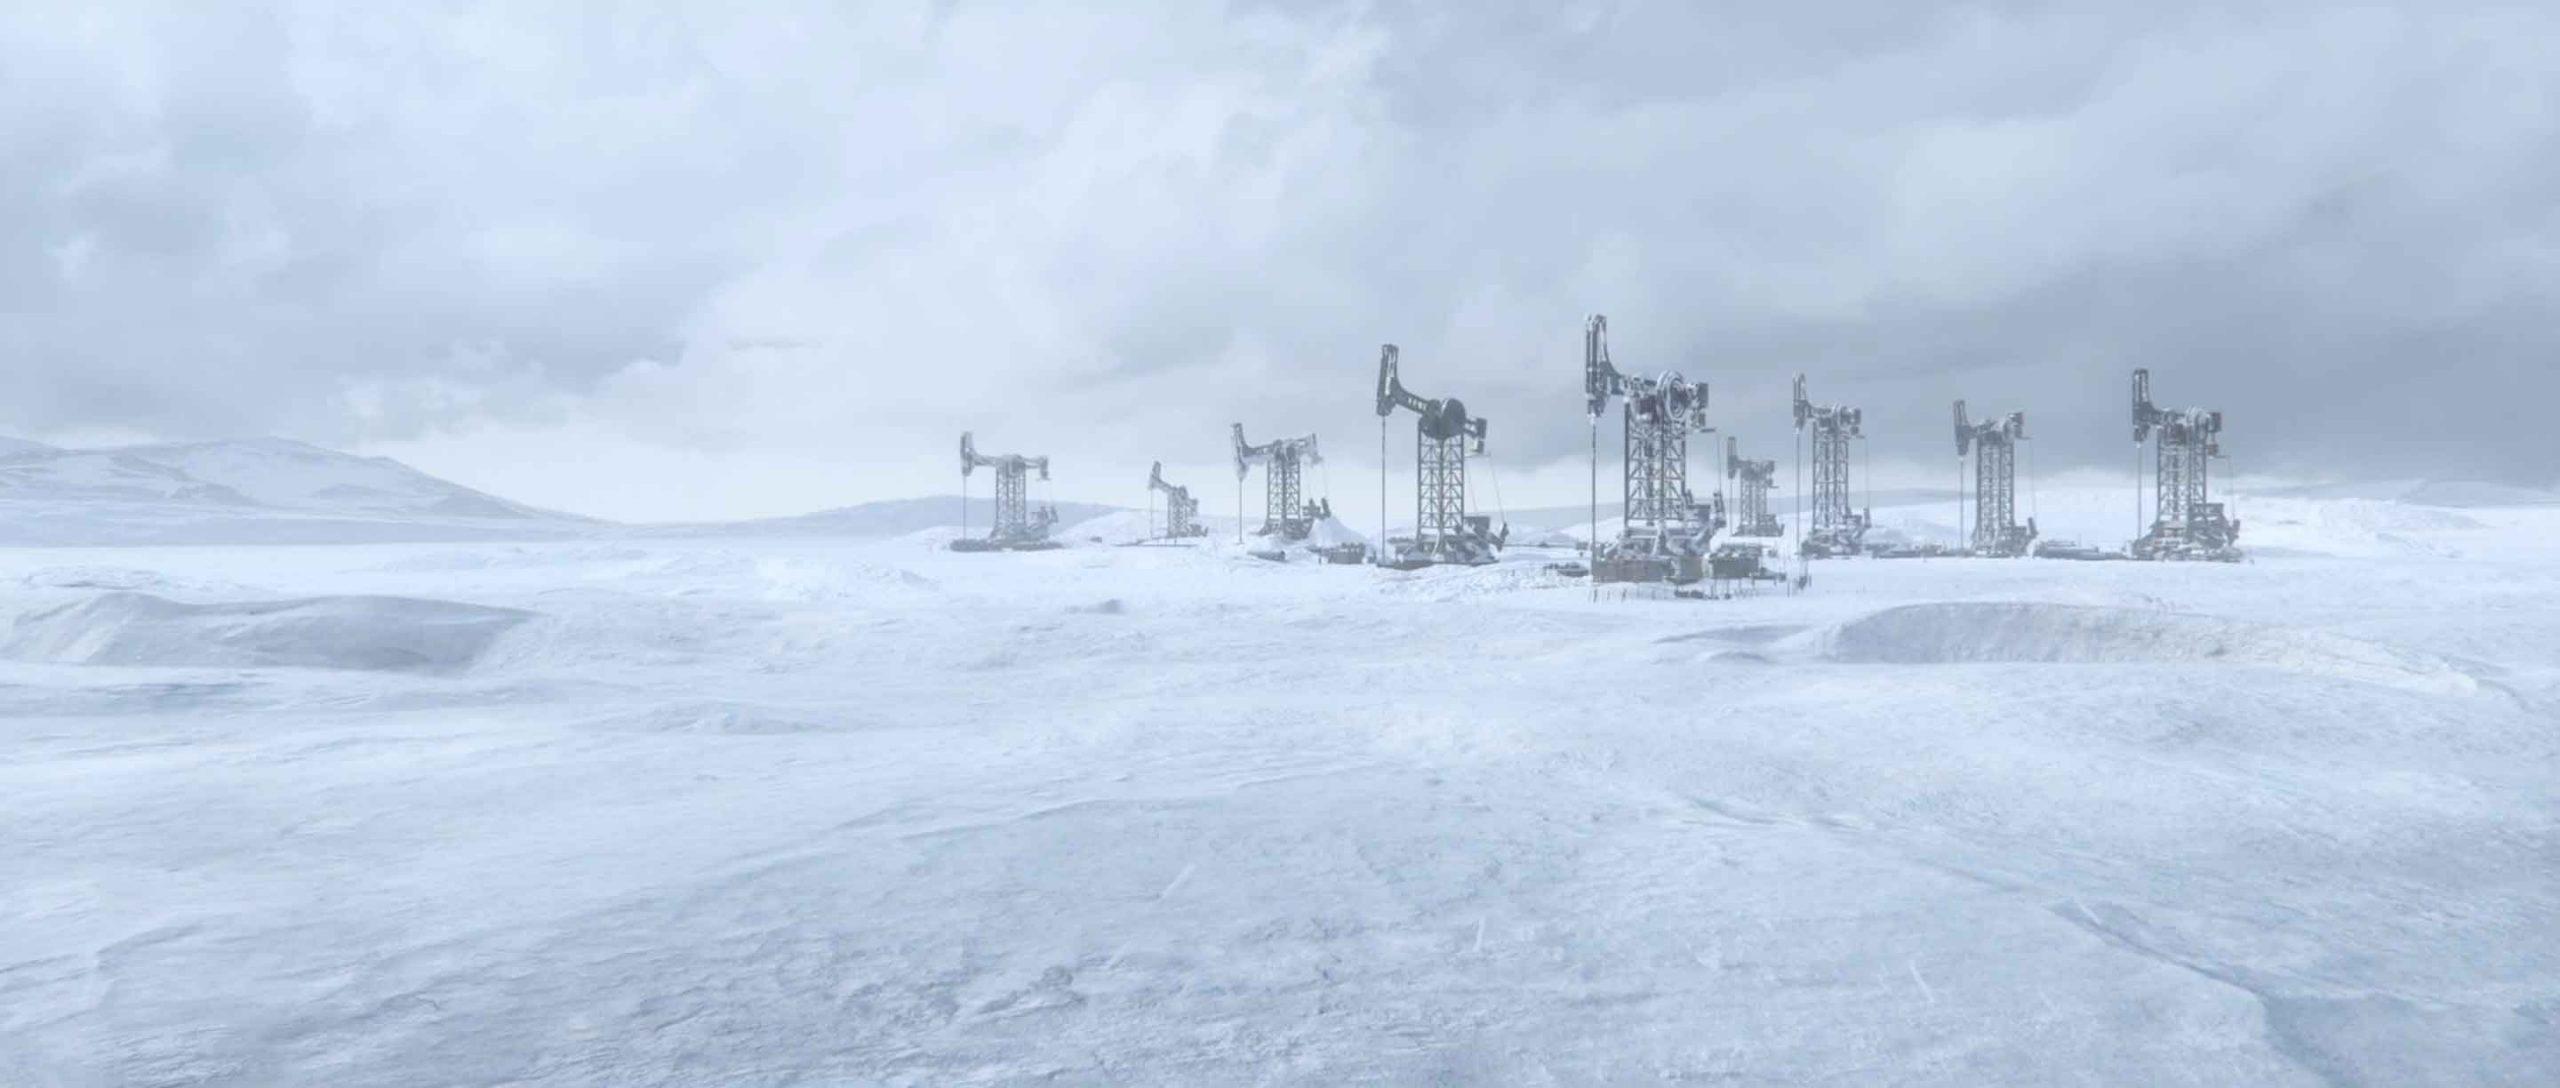 """Frostpunk 2: Liar"" Game Trailer by Marcin Panasiuk and Deep Blue | STASH MAGAZINE"